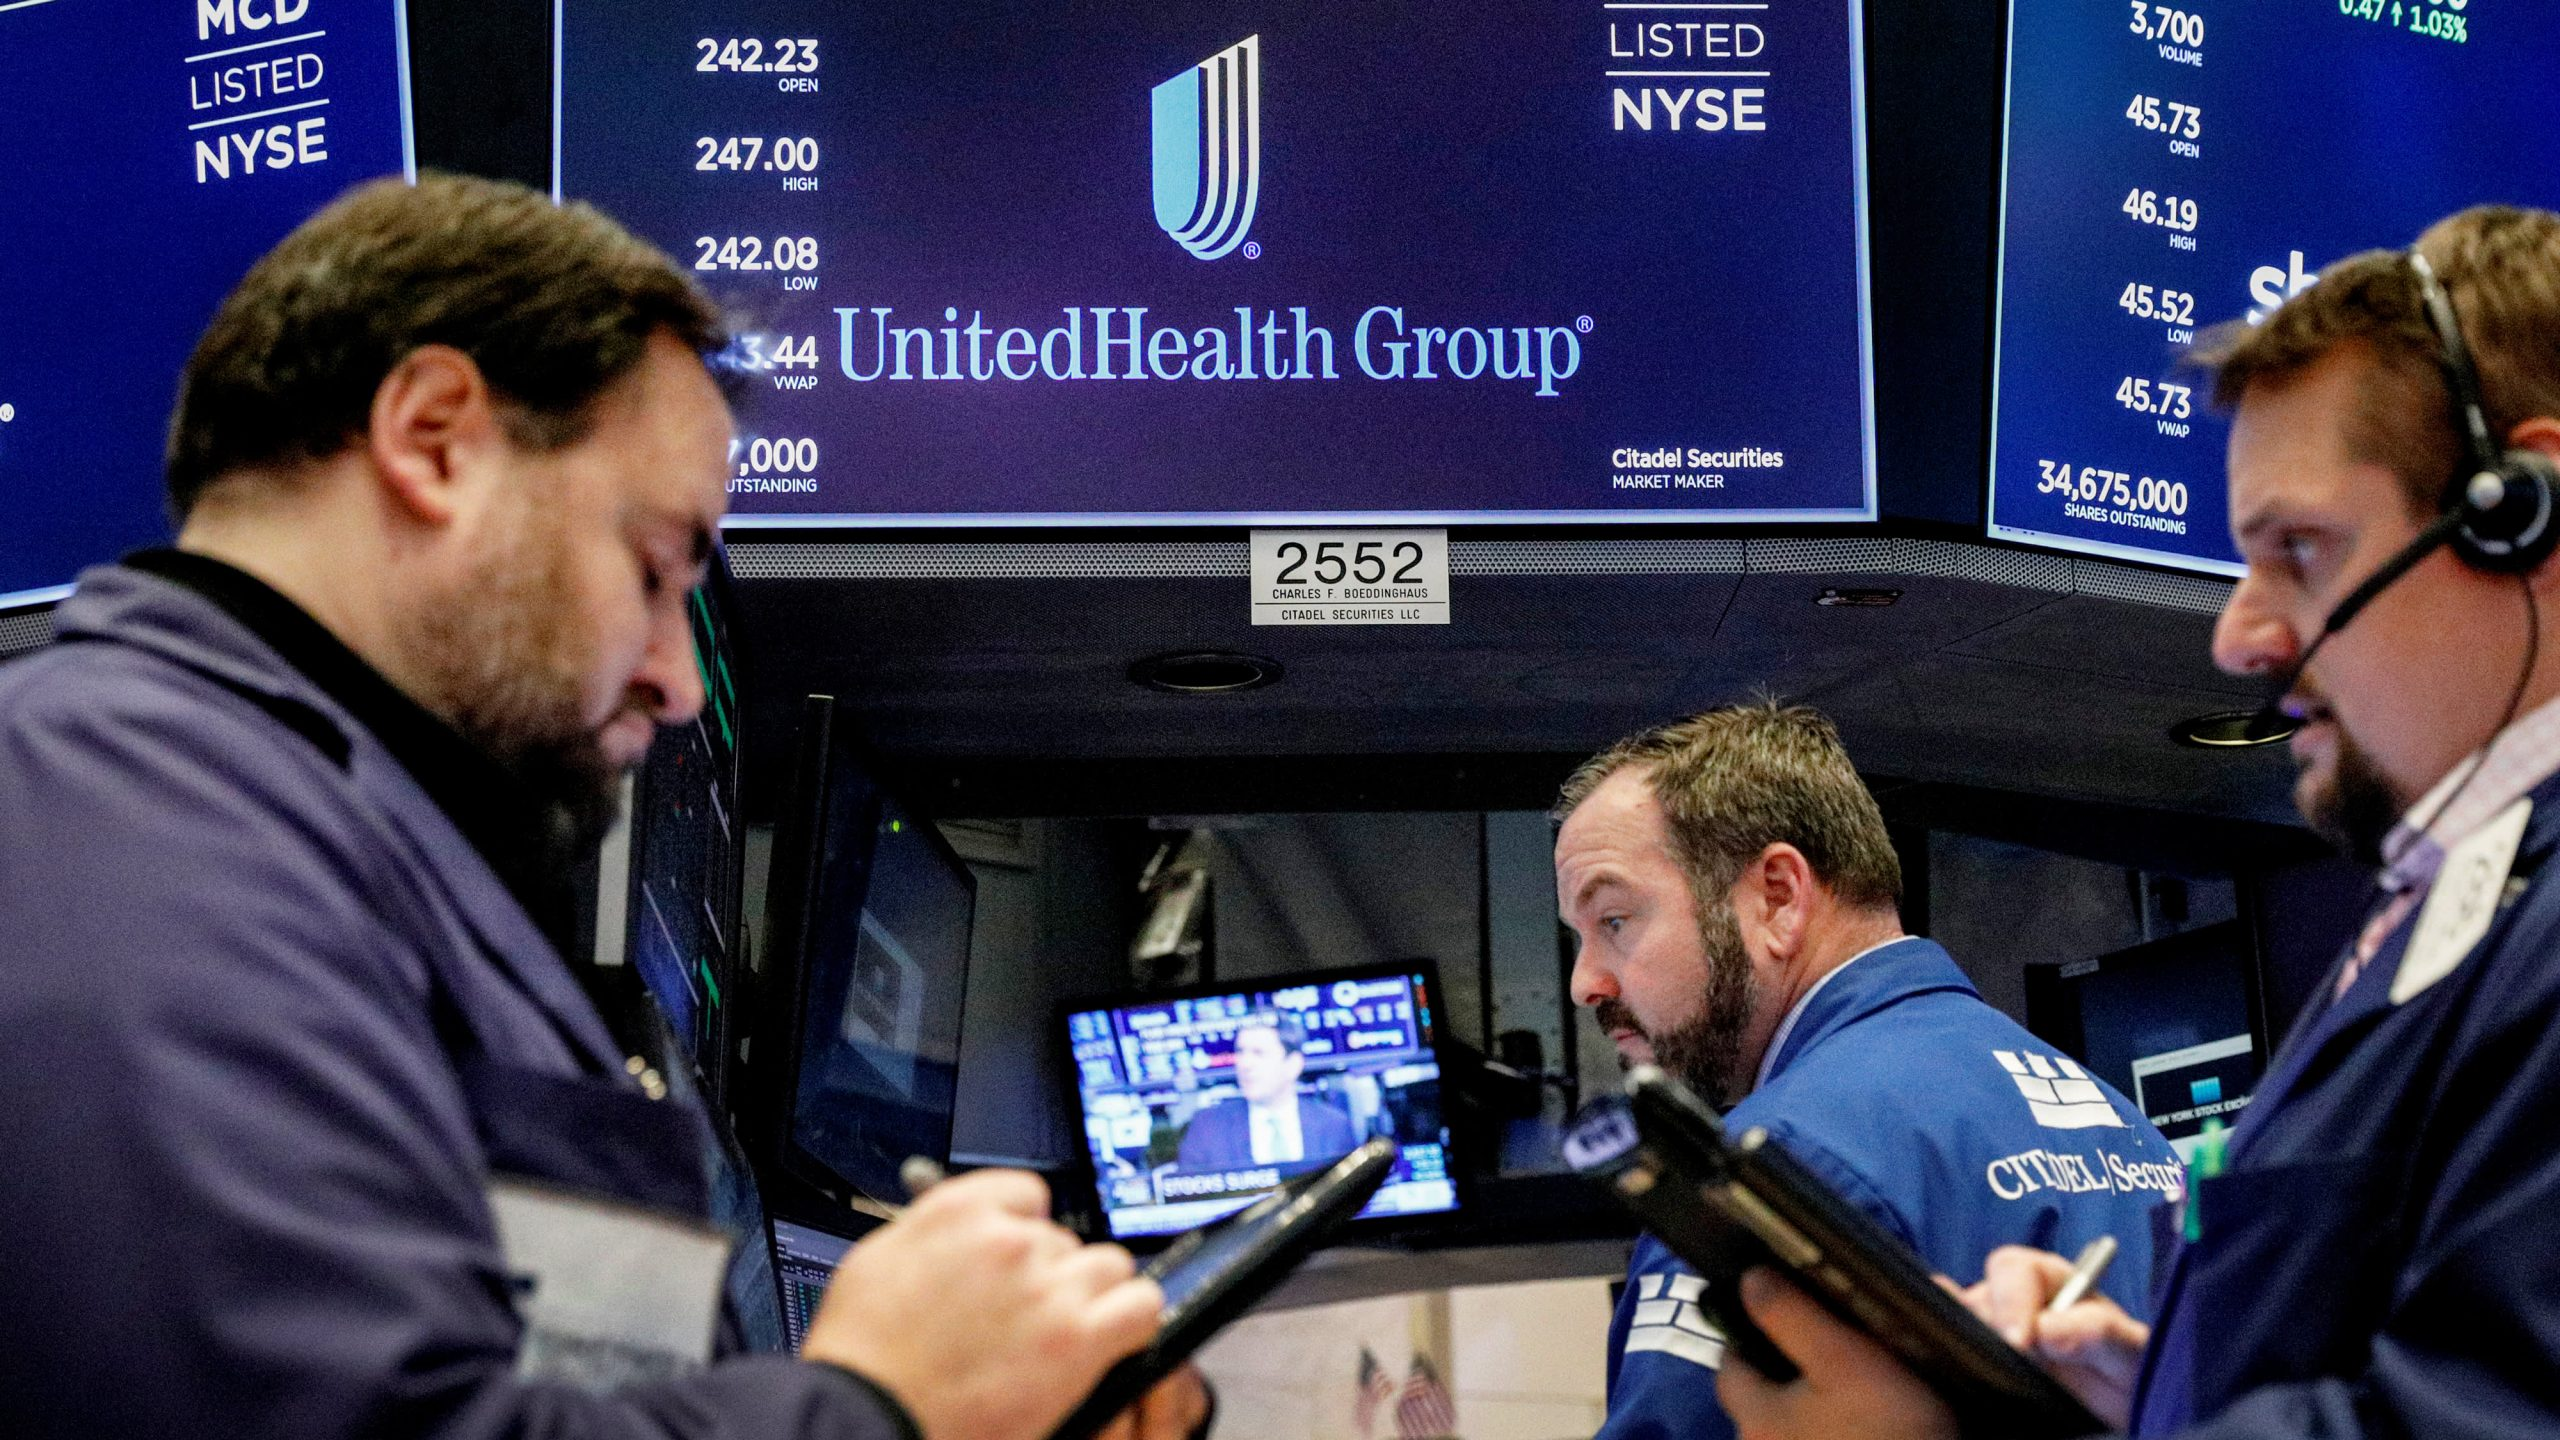 Health-care stocks are making a comeback, Jim Cramer says